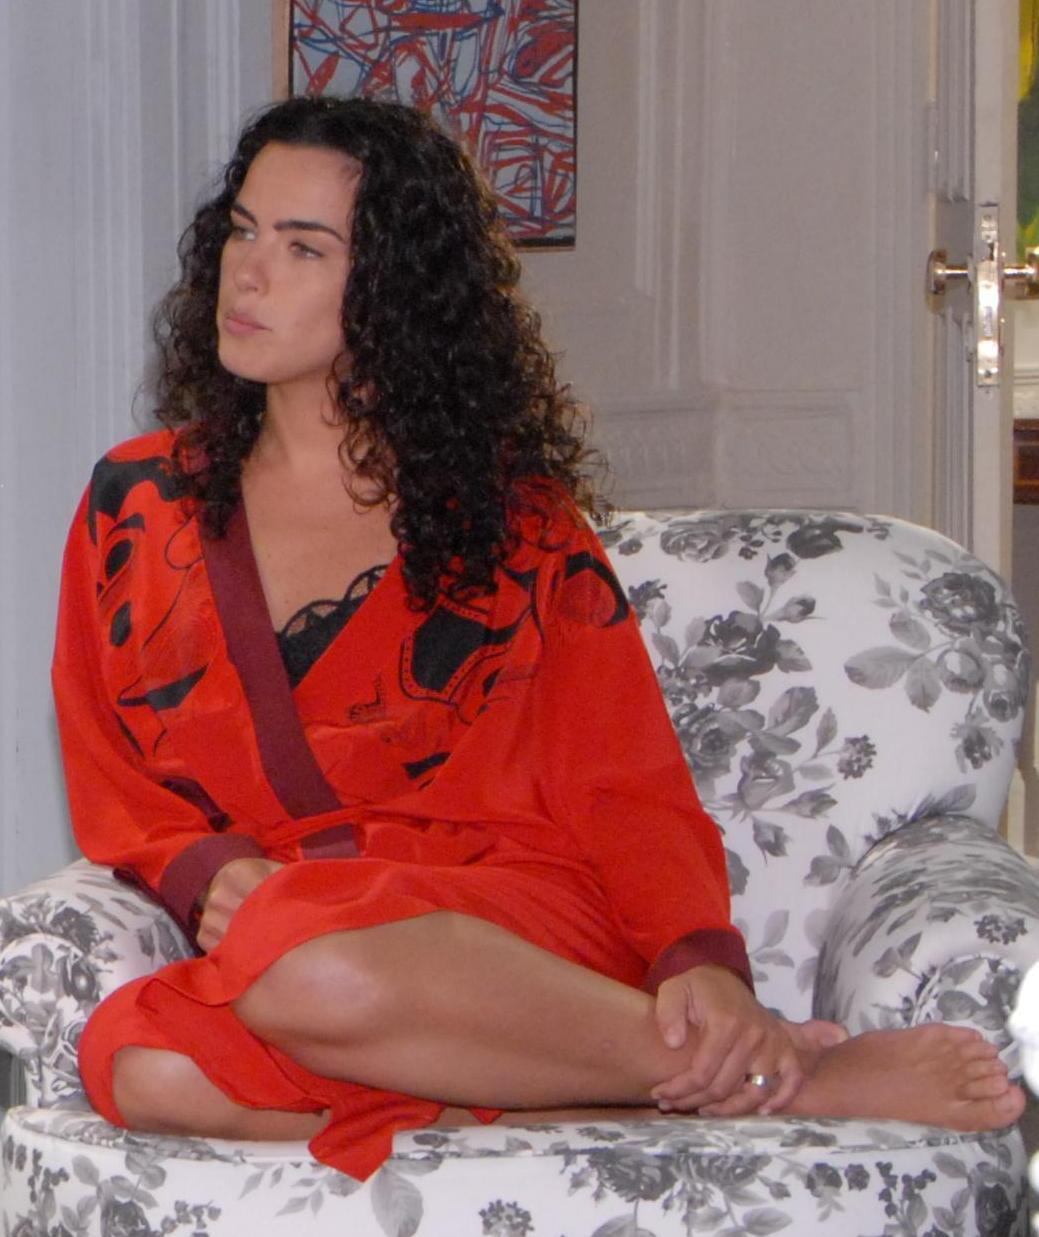 Ana Paula Arosio Sexo download sex pics ana paula arosio nude photos 2019 2020 hot